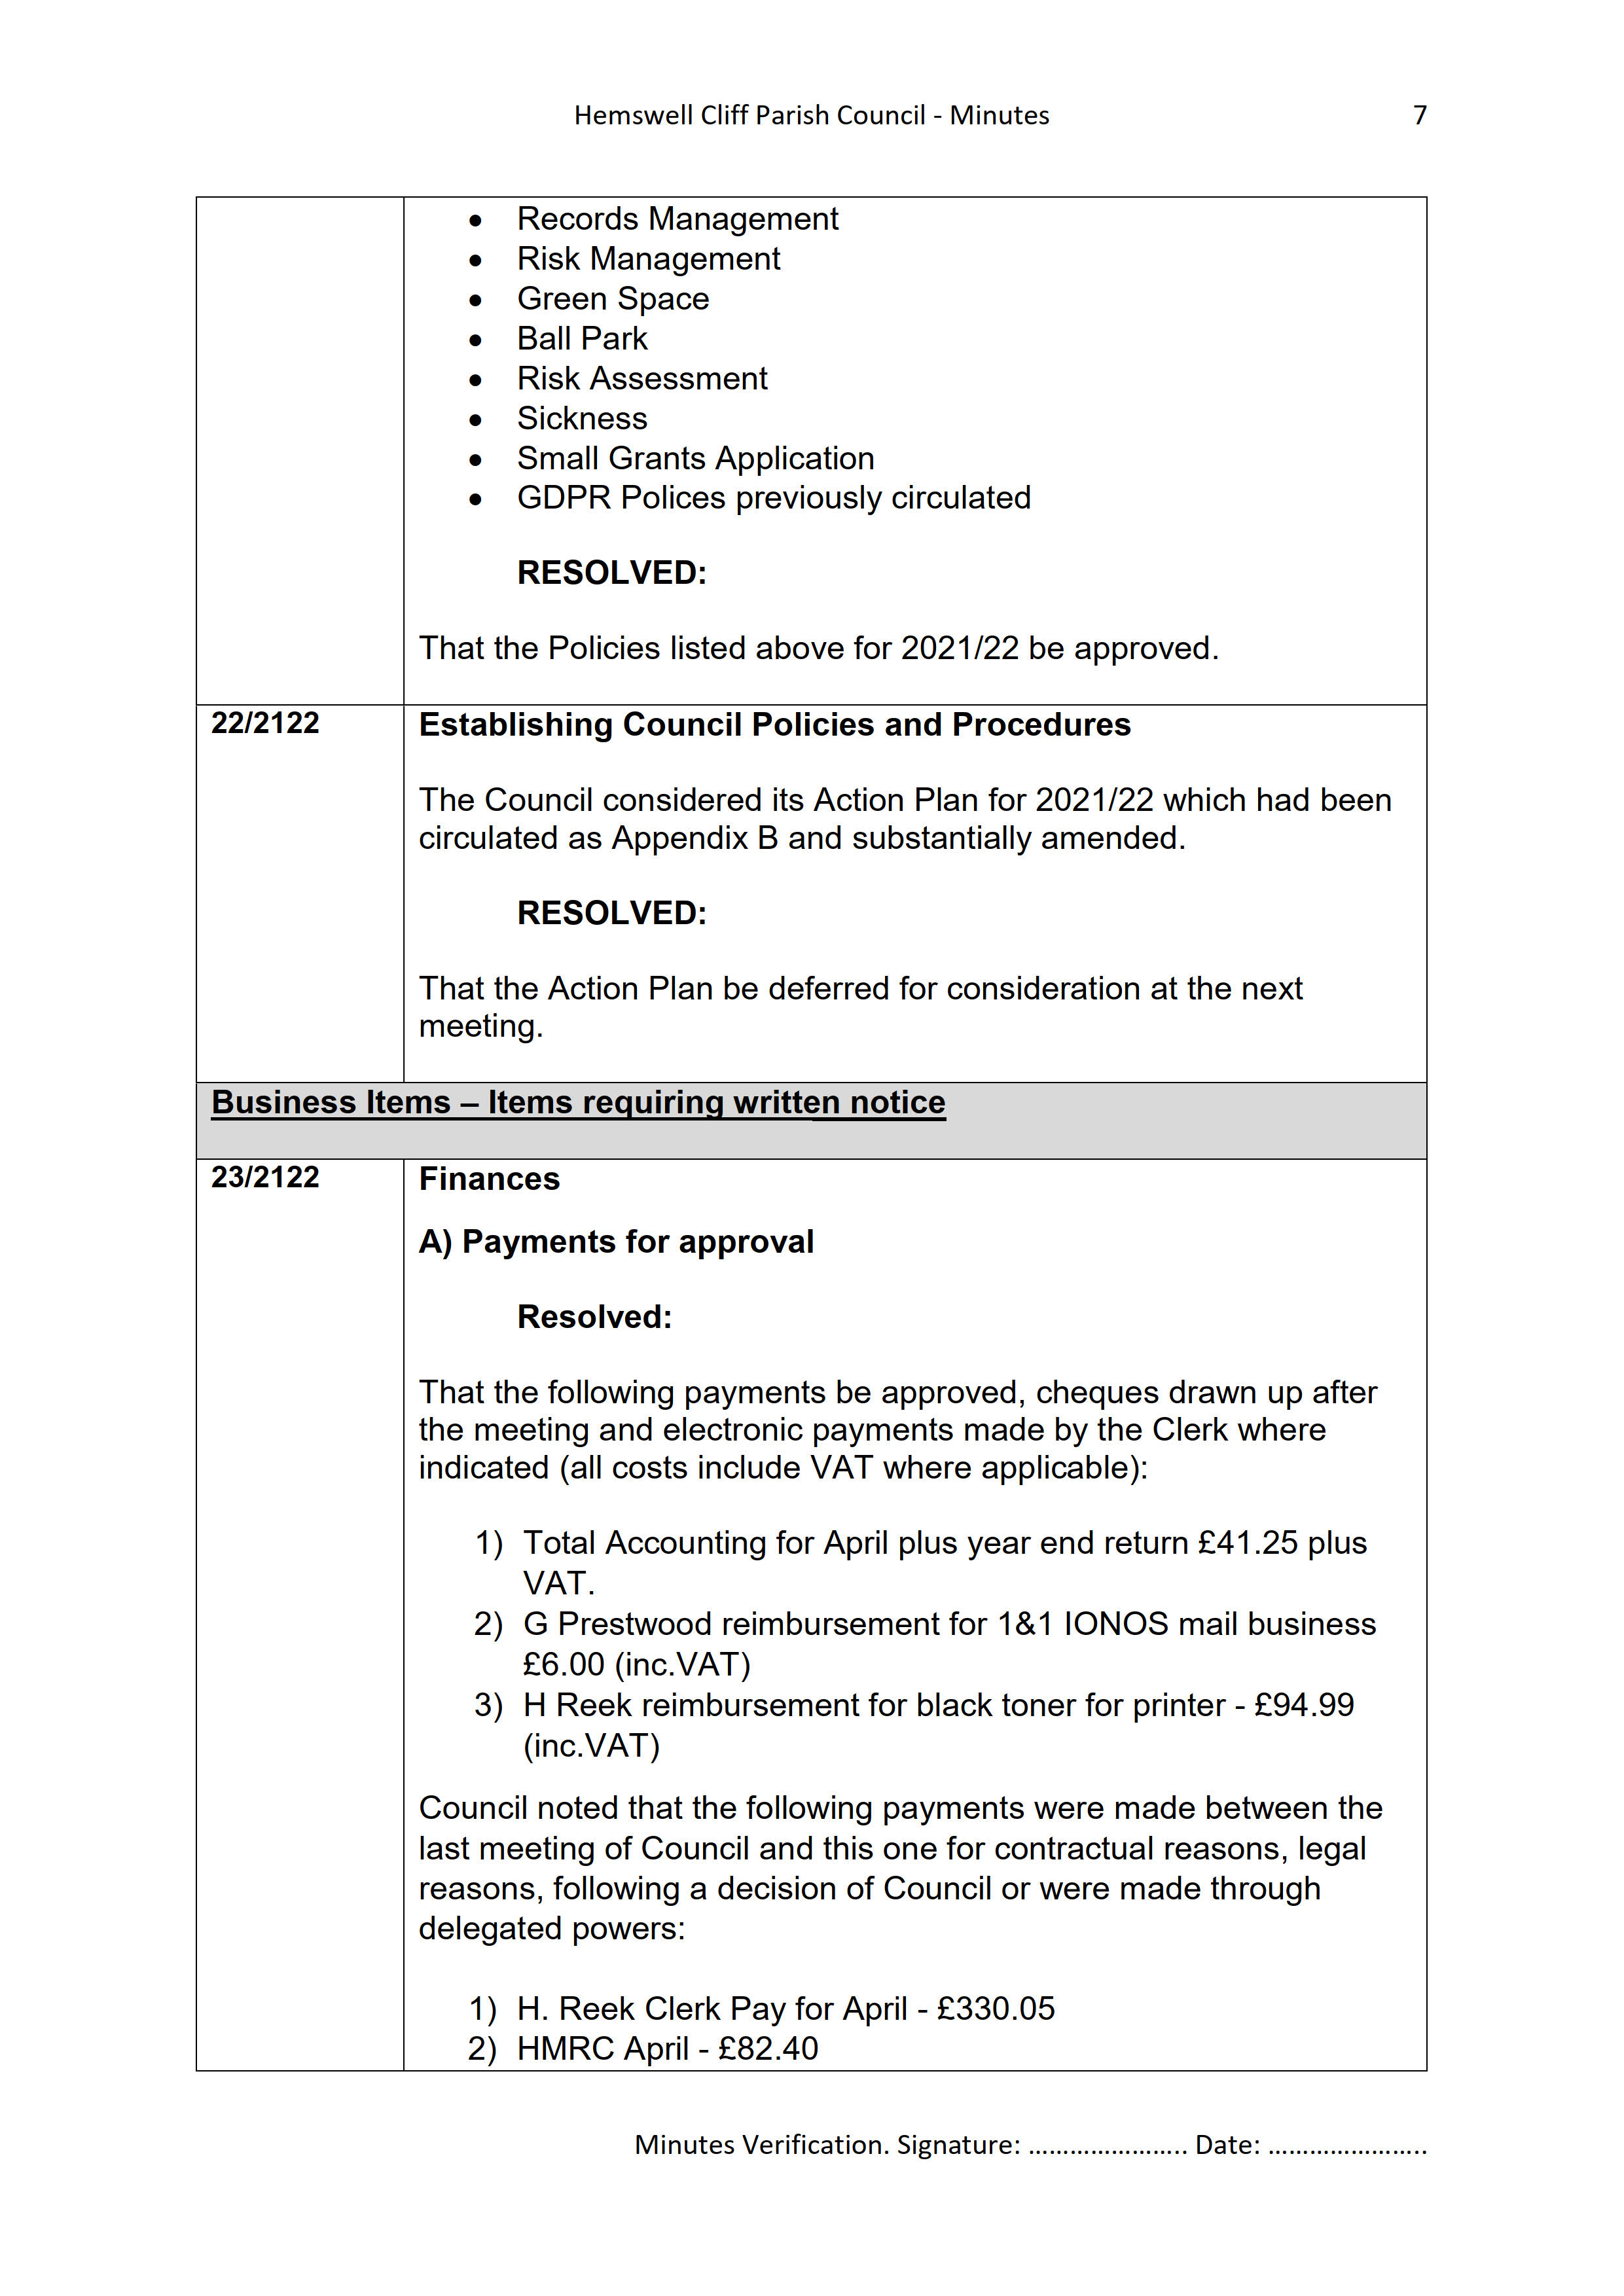 HCPC_AnnualMeetingMinutes_17.05.21_07.jpg